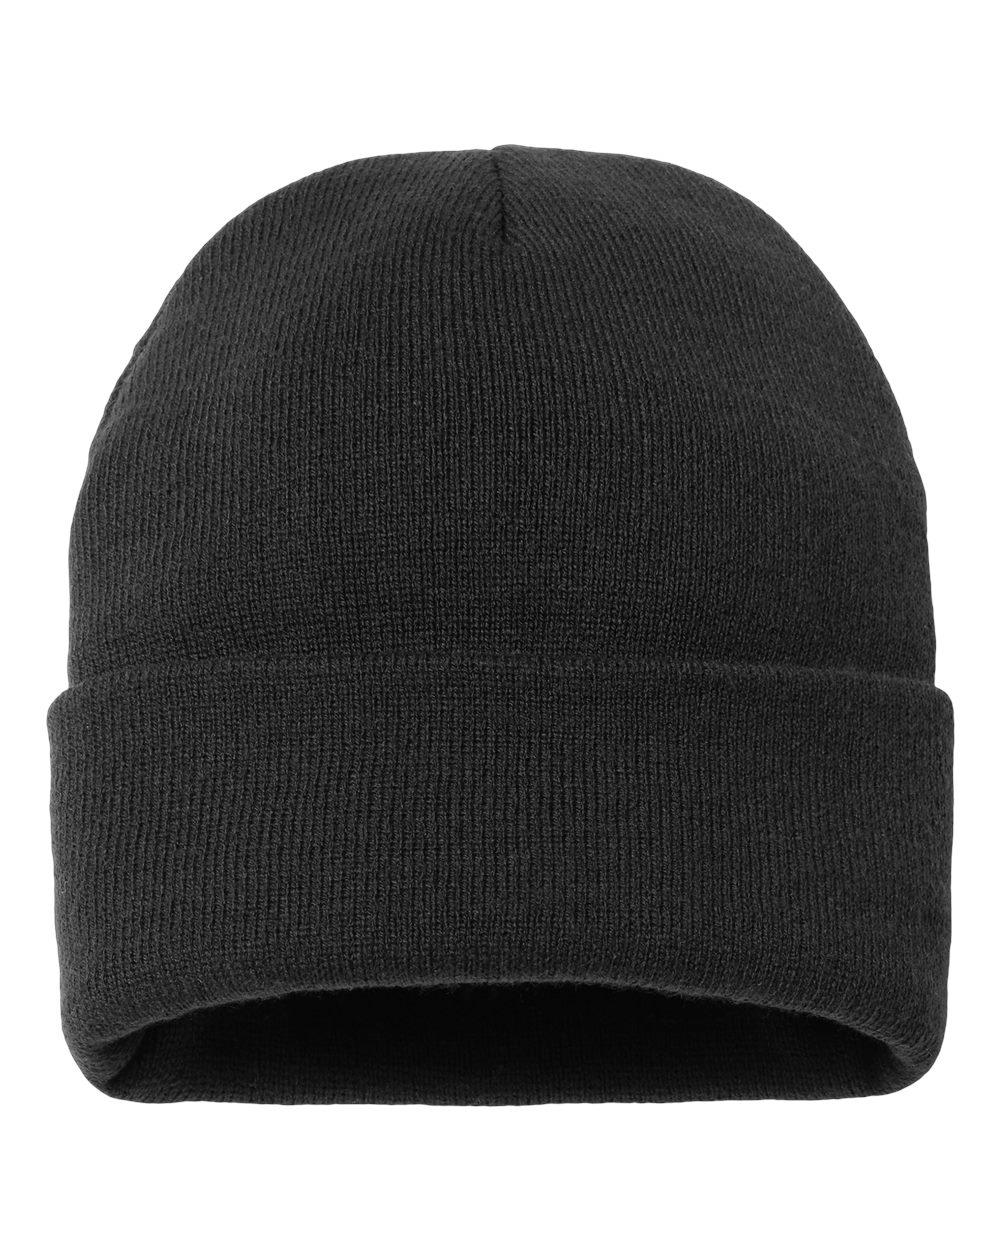 "Sportsman Caps SP12JL - Jersey Lined 12"" Knit Beanie"